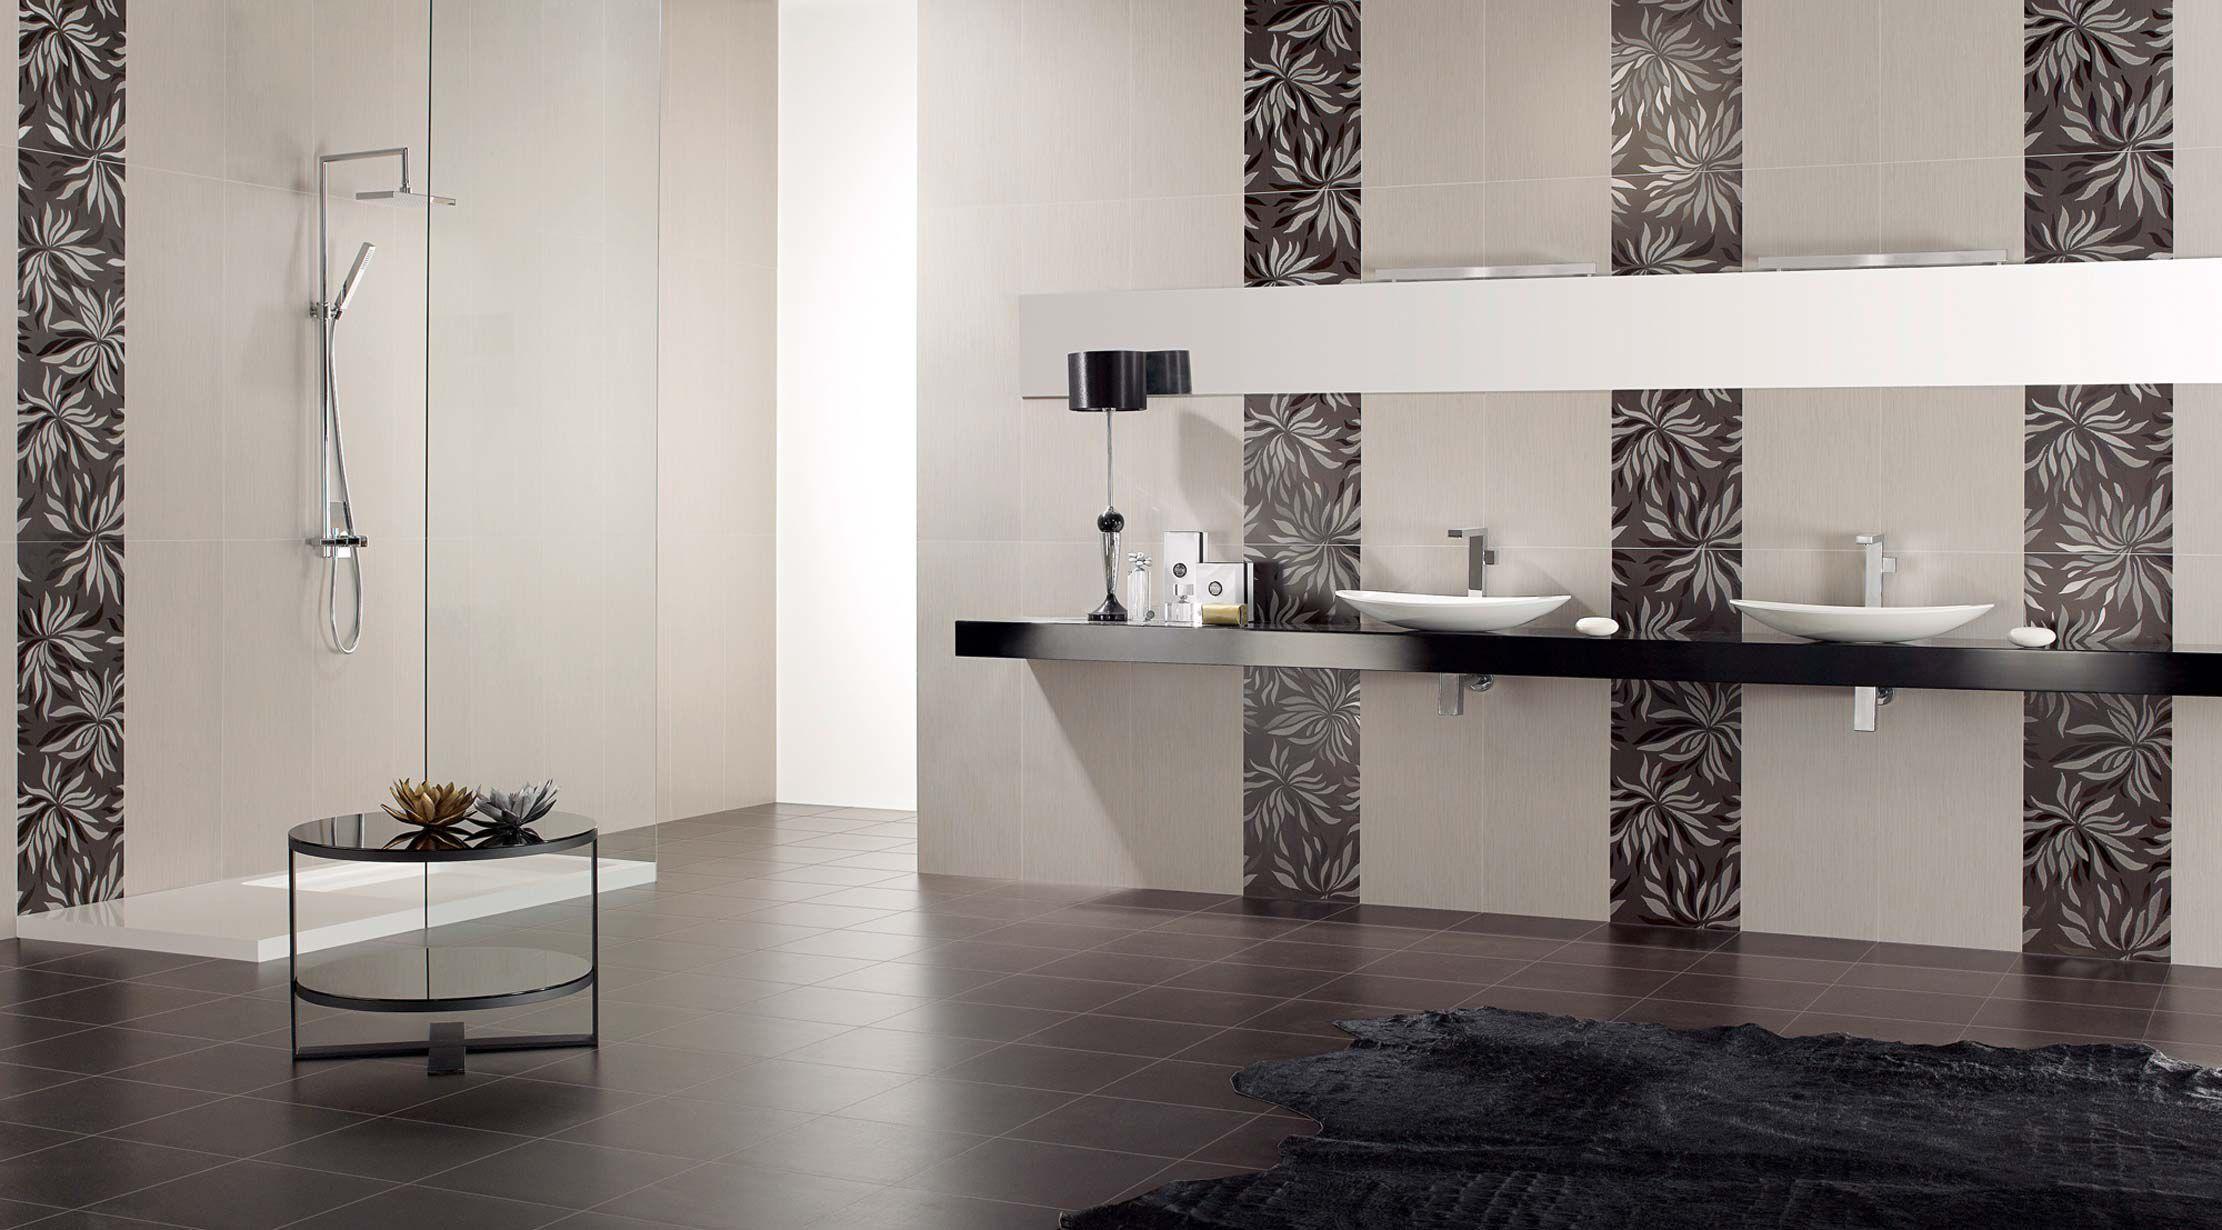 Carrelage de salle de bain / de sol / mural / en grès cérame ...